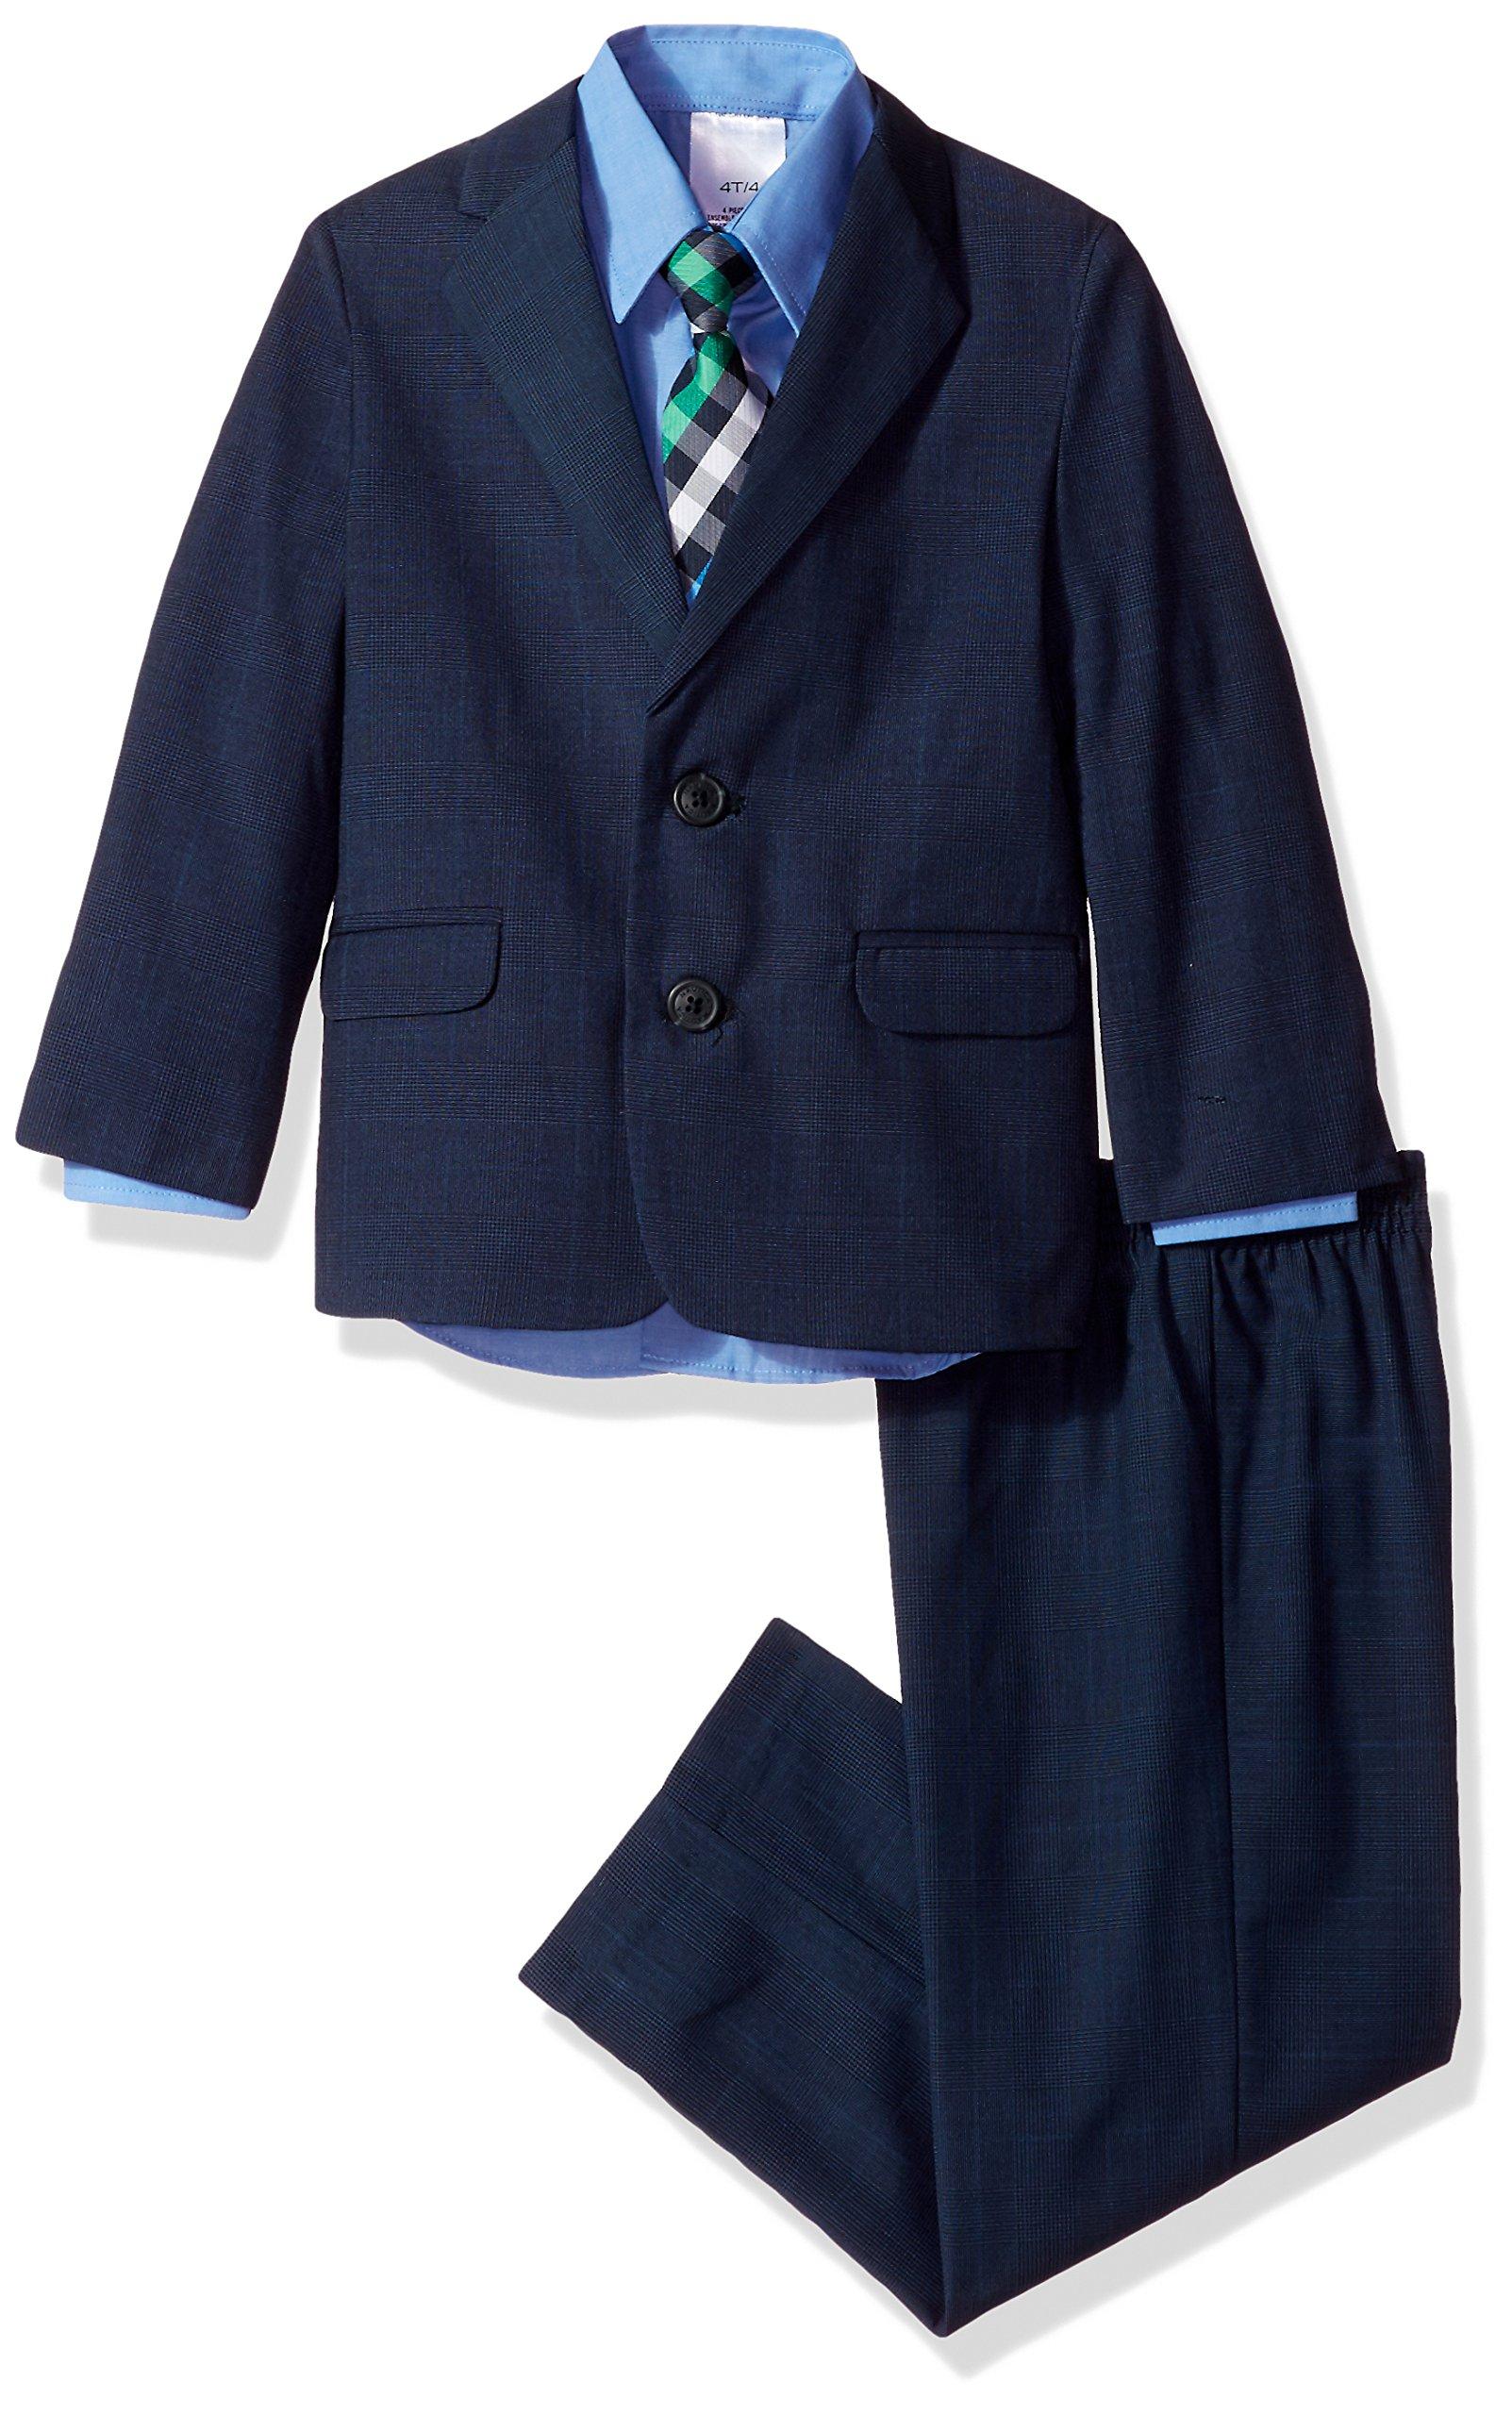 Nautica Boys' 4-Piece Suit Set with Dress Shirt, Tie, Jacket, and Pants, Navy/Navy, 5